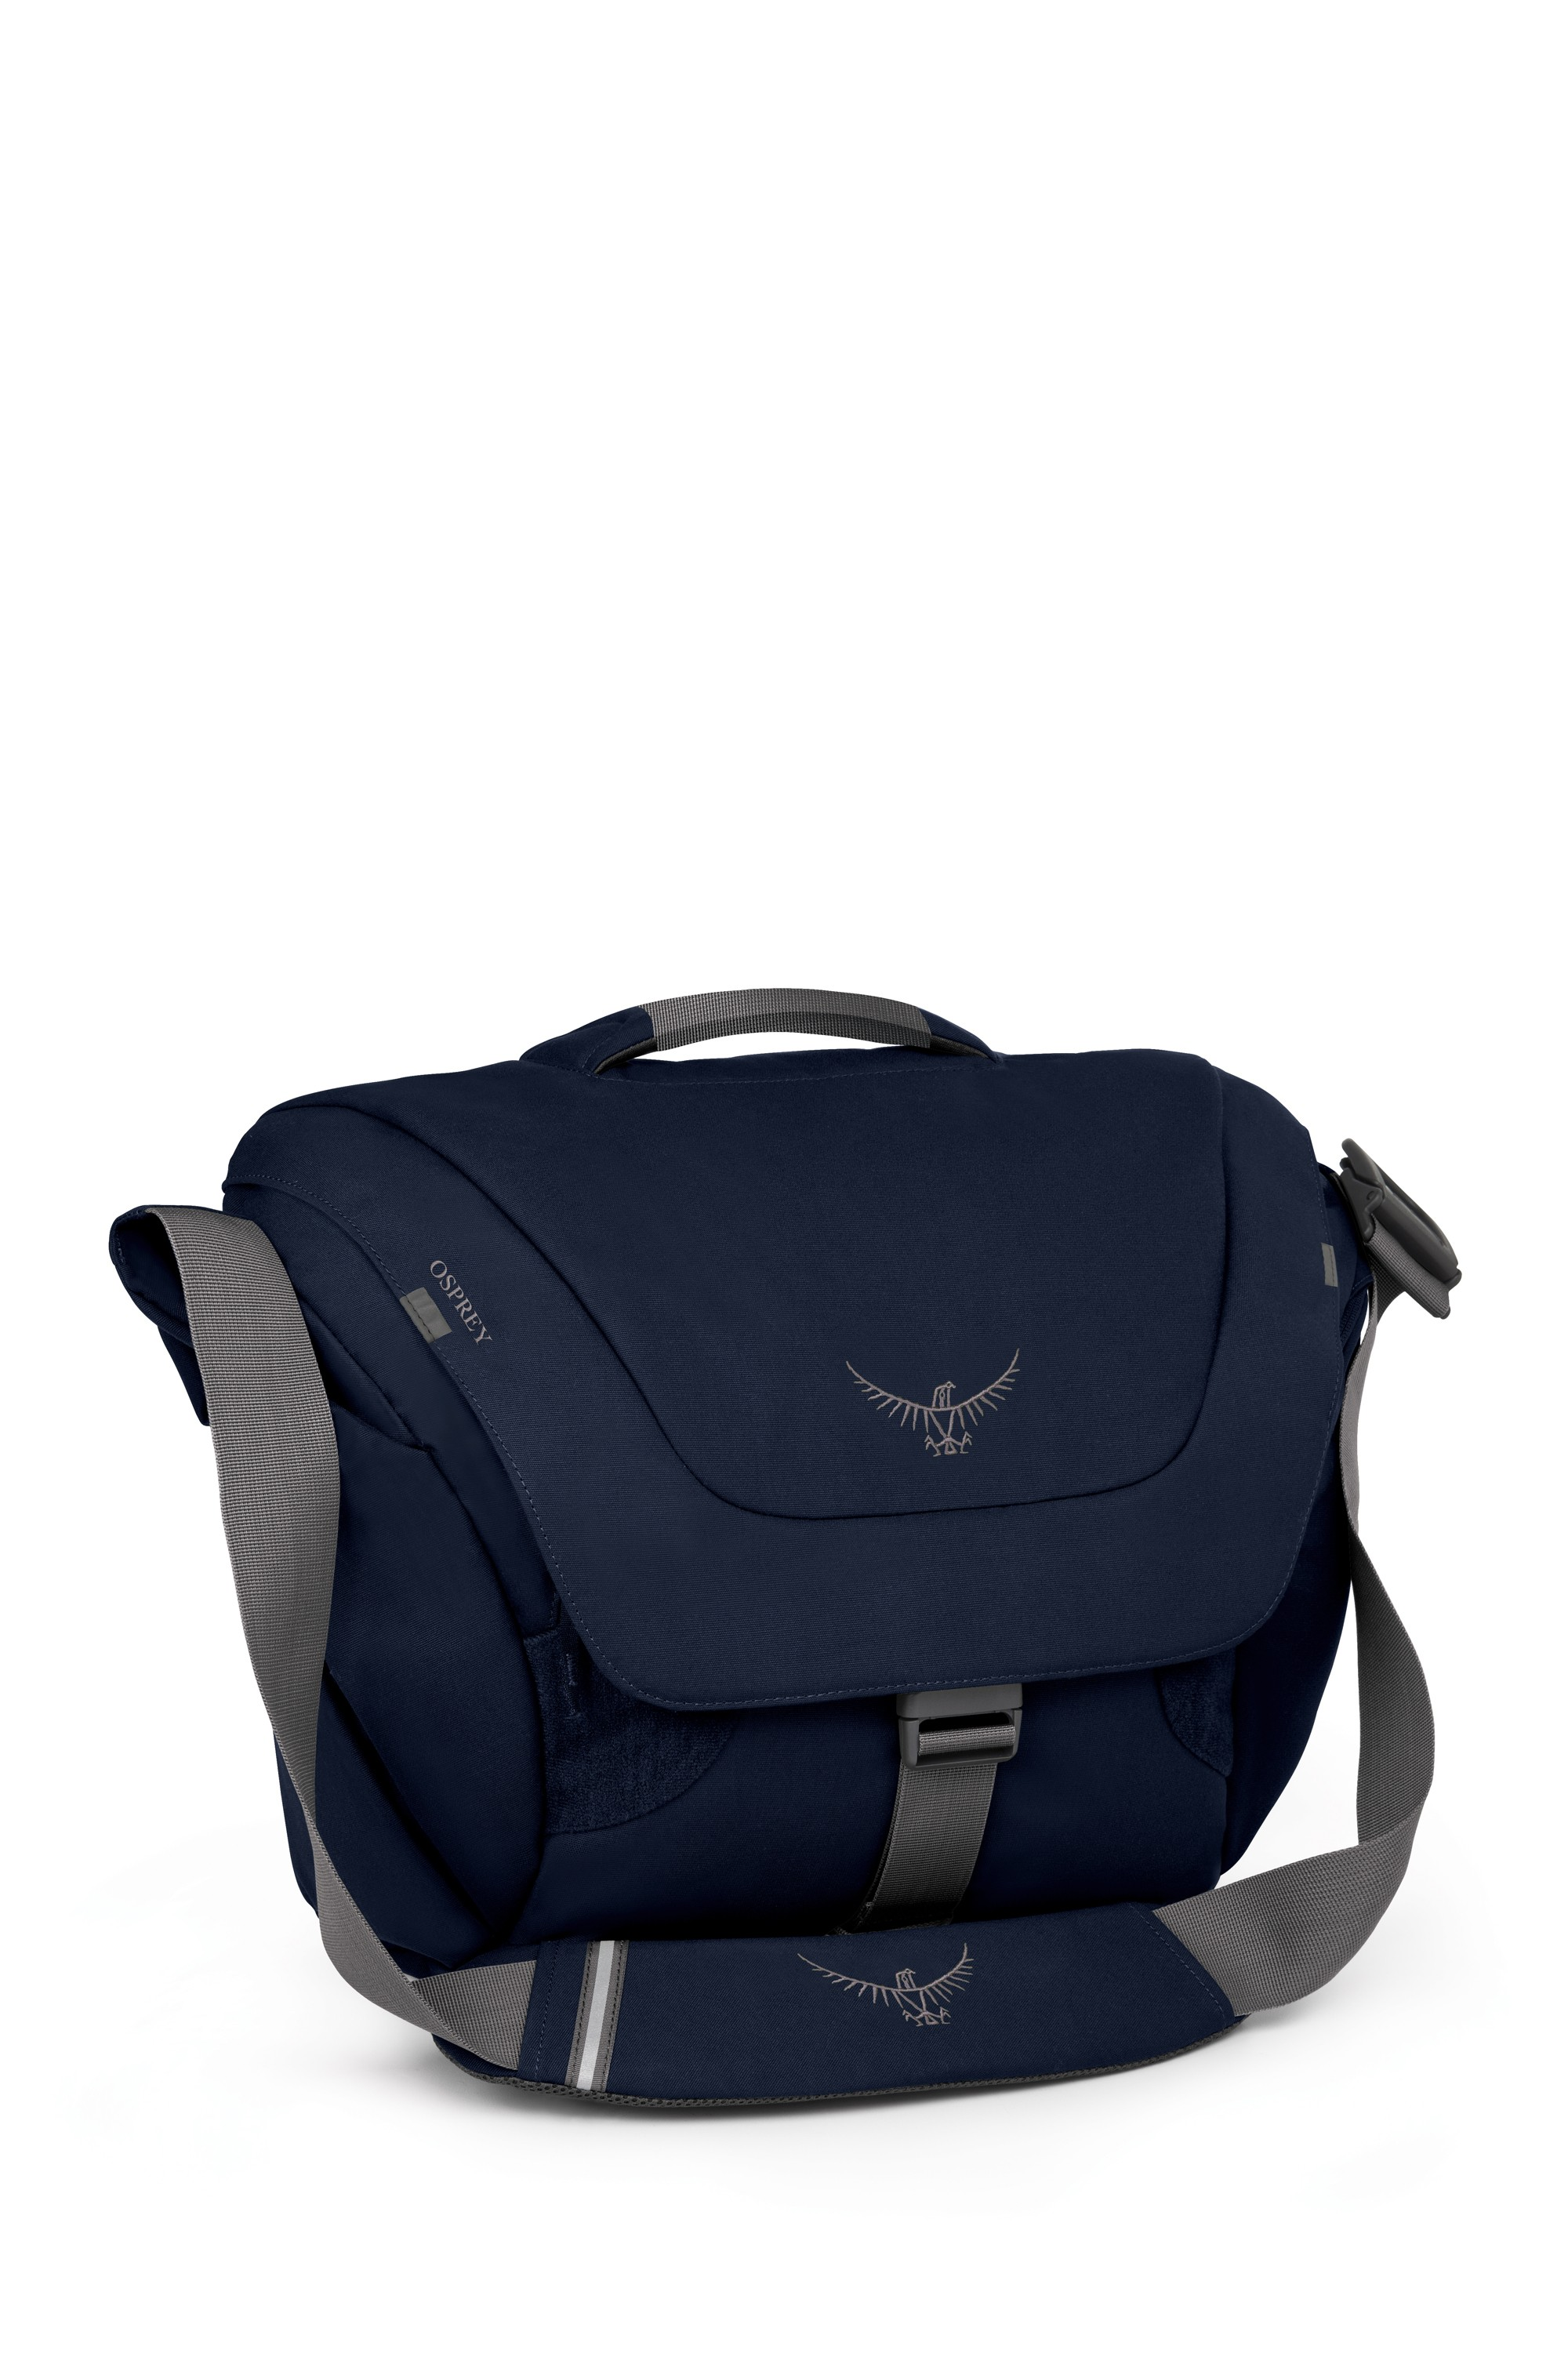 Taška Osprey Flap Jack Courier 2016 Barva: Twilight Blue